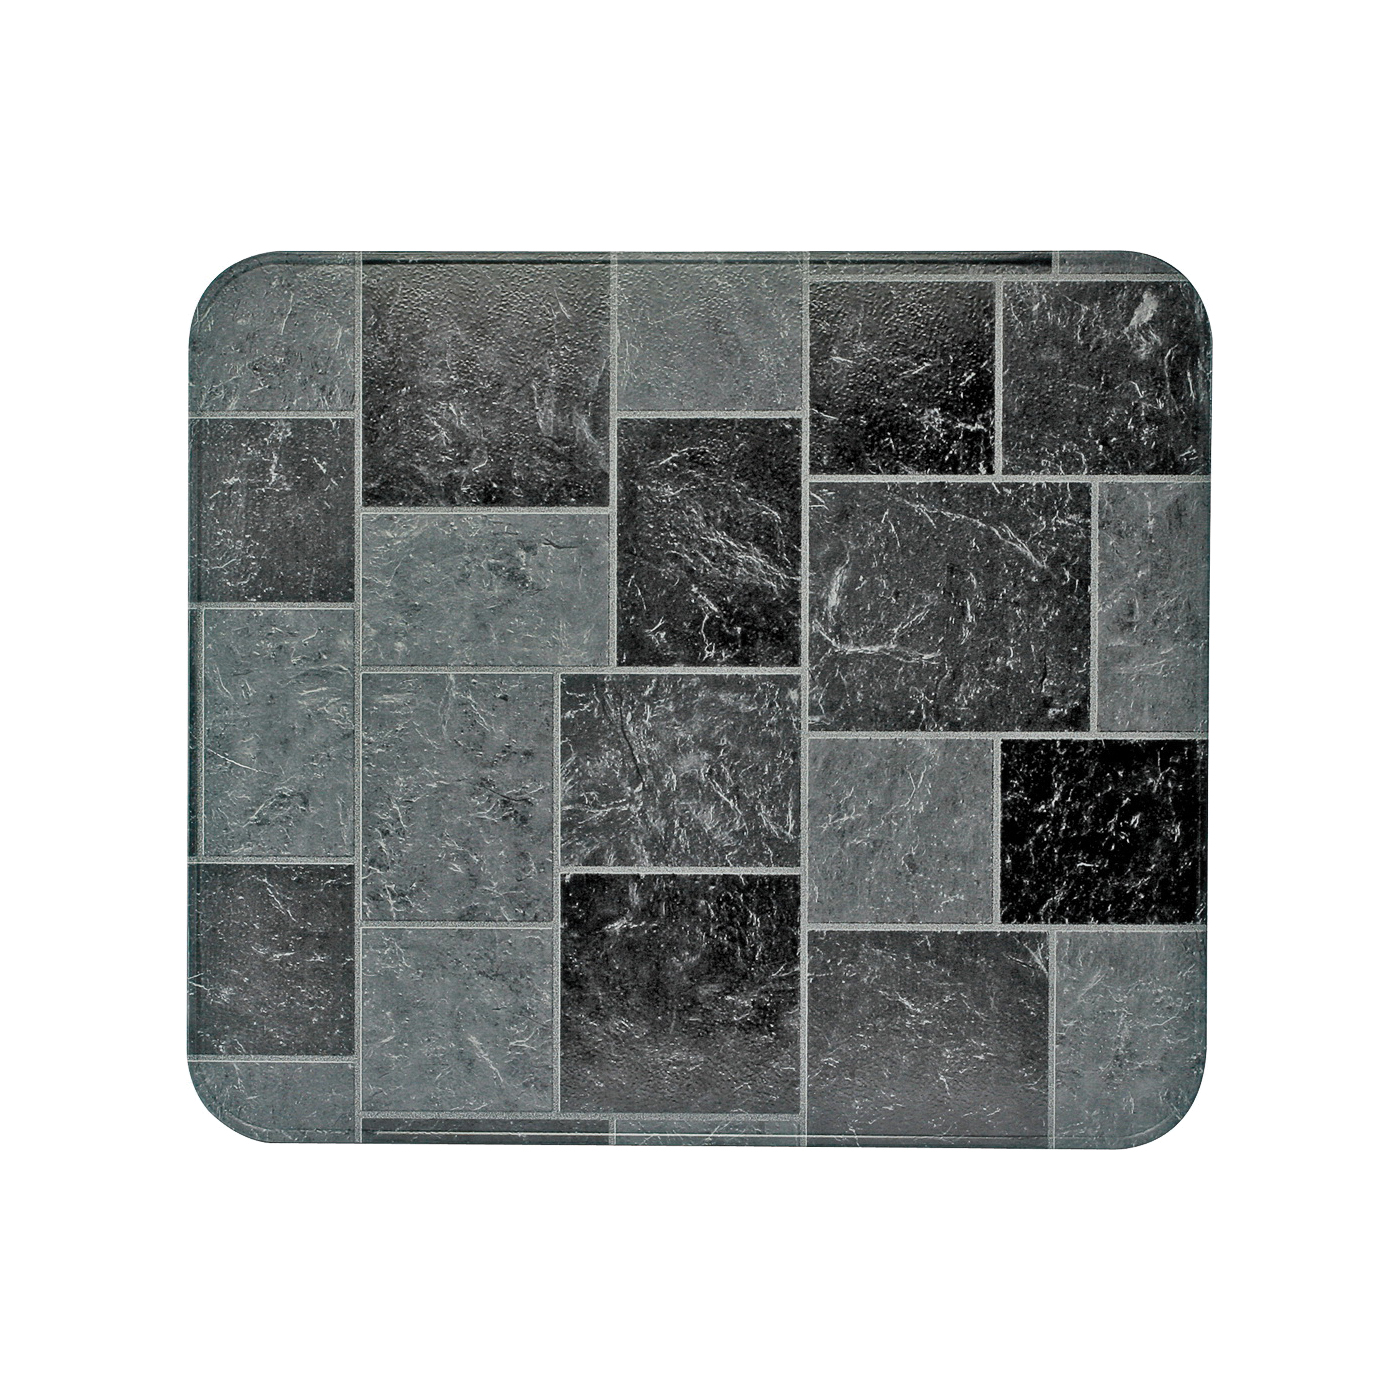 Picture of HY-C T2UL3652GT-1 Stove Board, 52 in L, 36 in W, Steel, Slate Gray